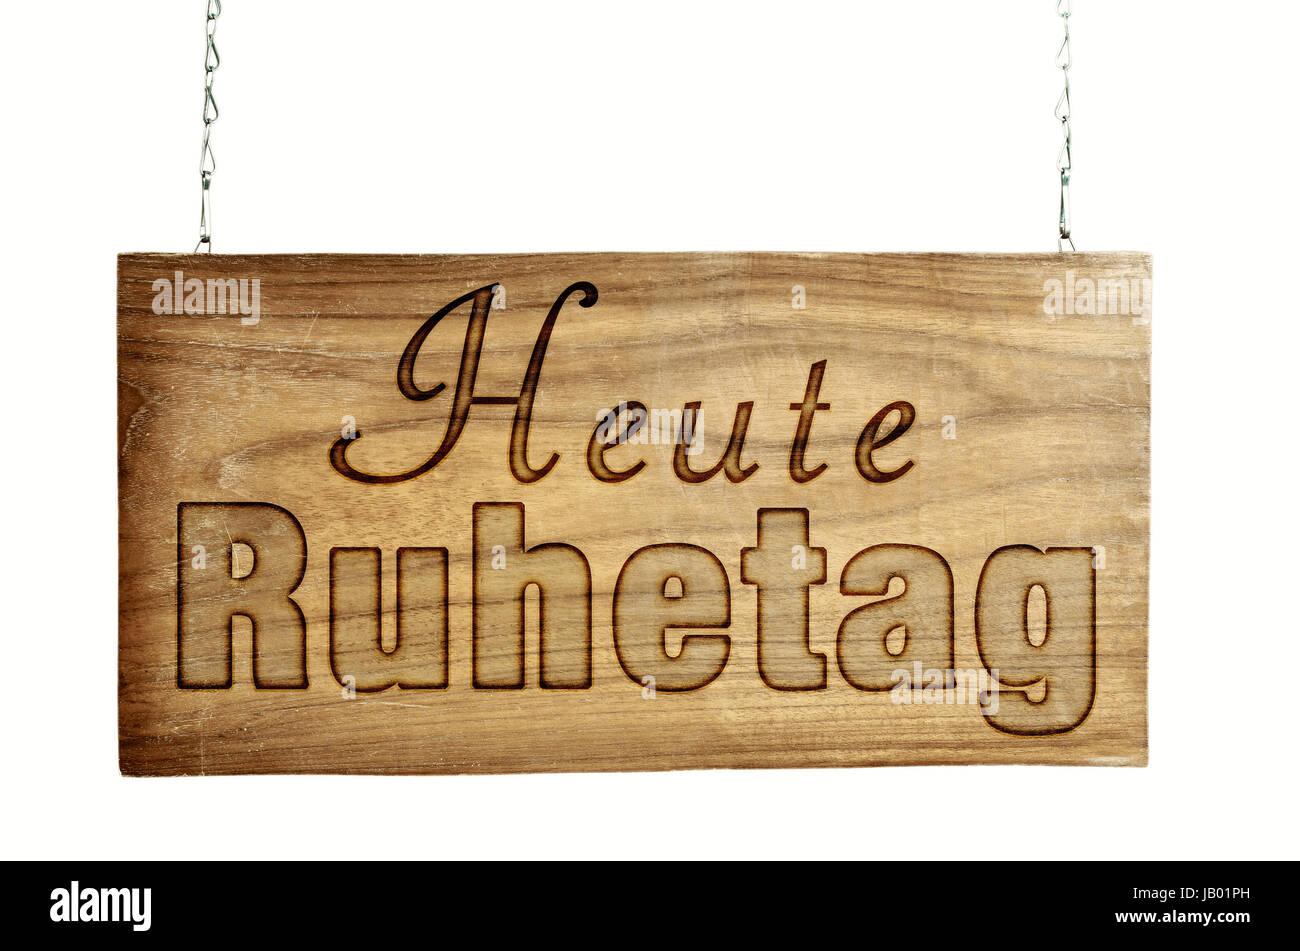 Ruhetag Türschild Aus Holz Hängt Kette Stock Photo: 144445577 - Alamy